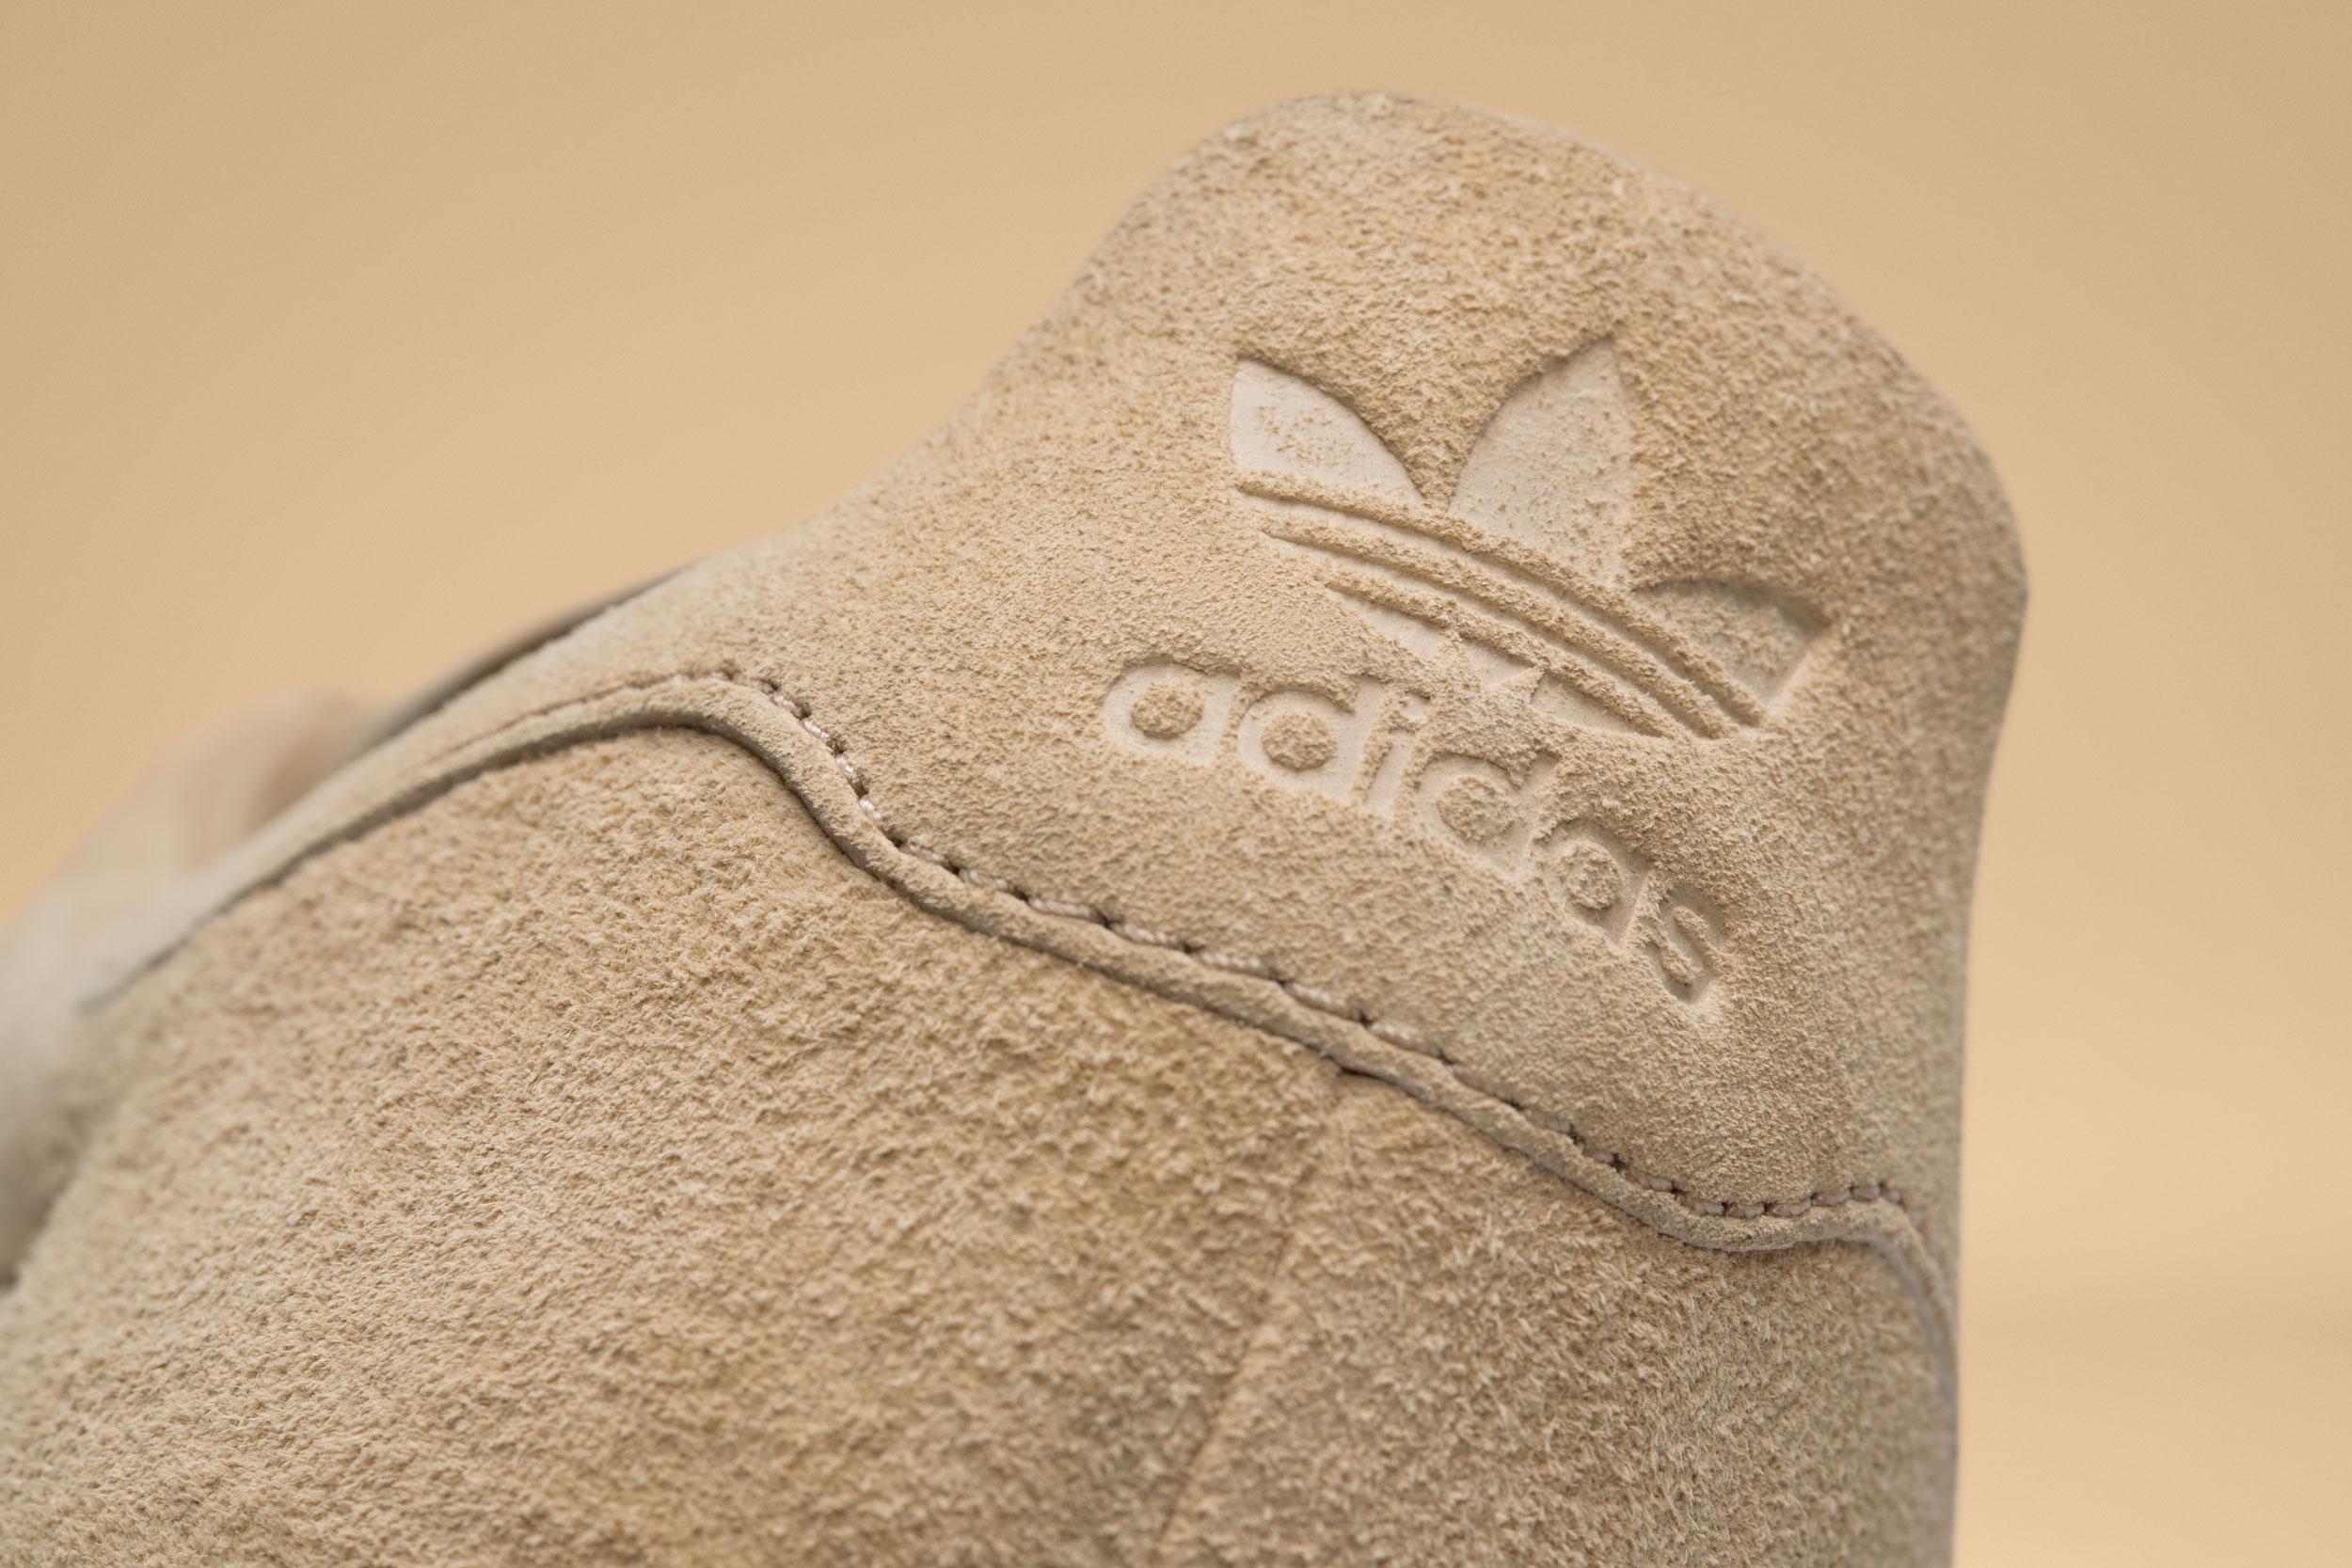 Adidas Samoa 'Pigskin Pack' Pale Nude